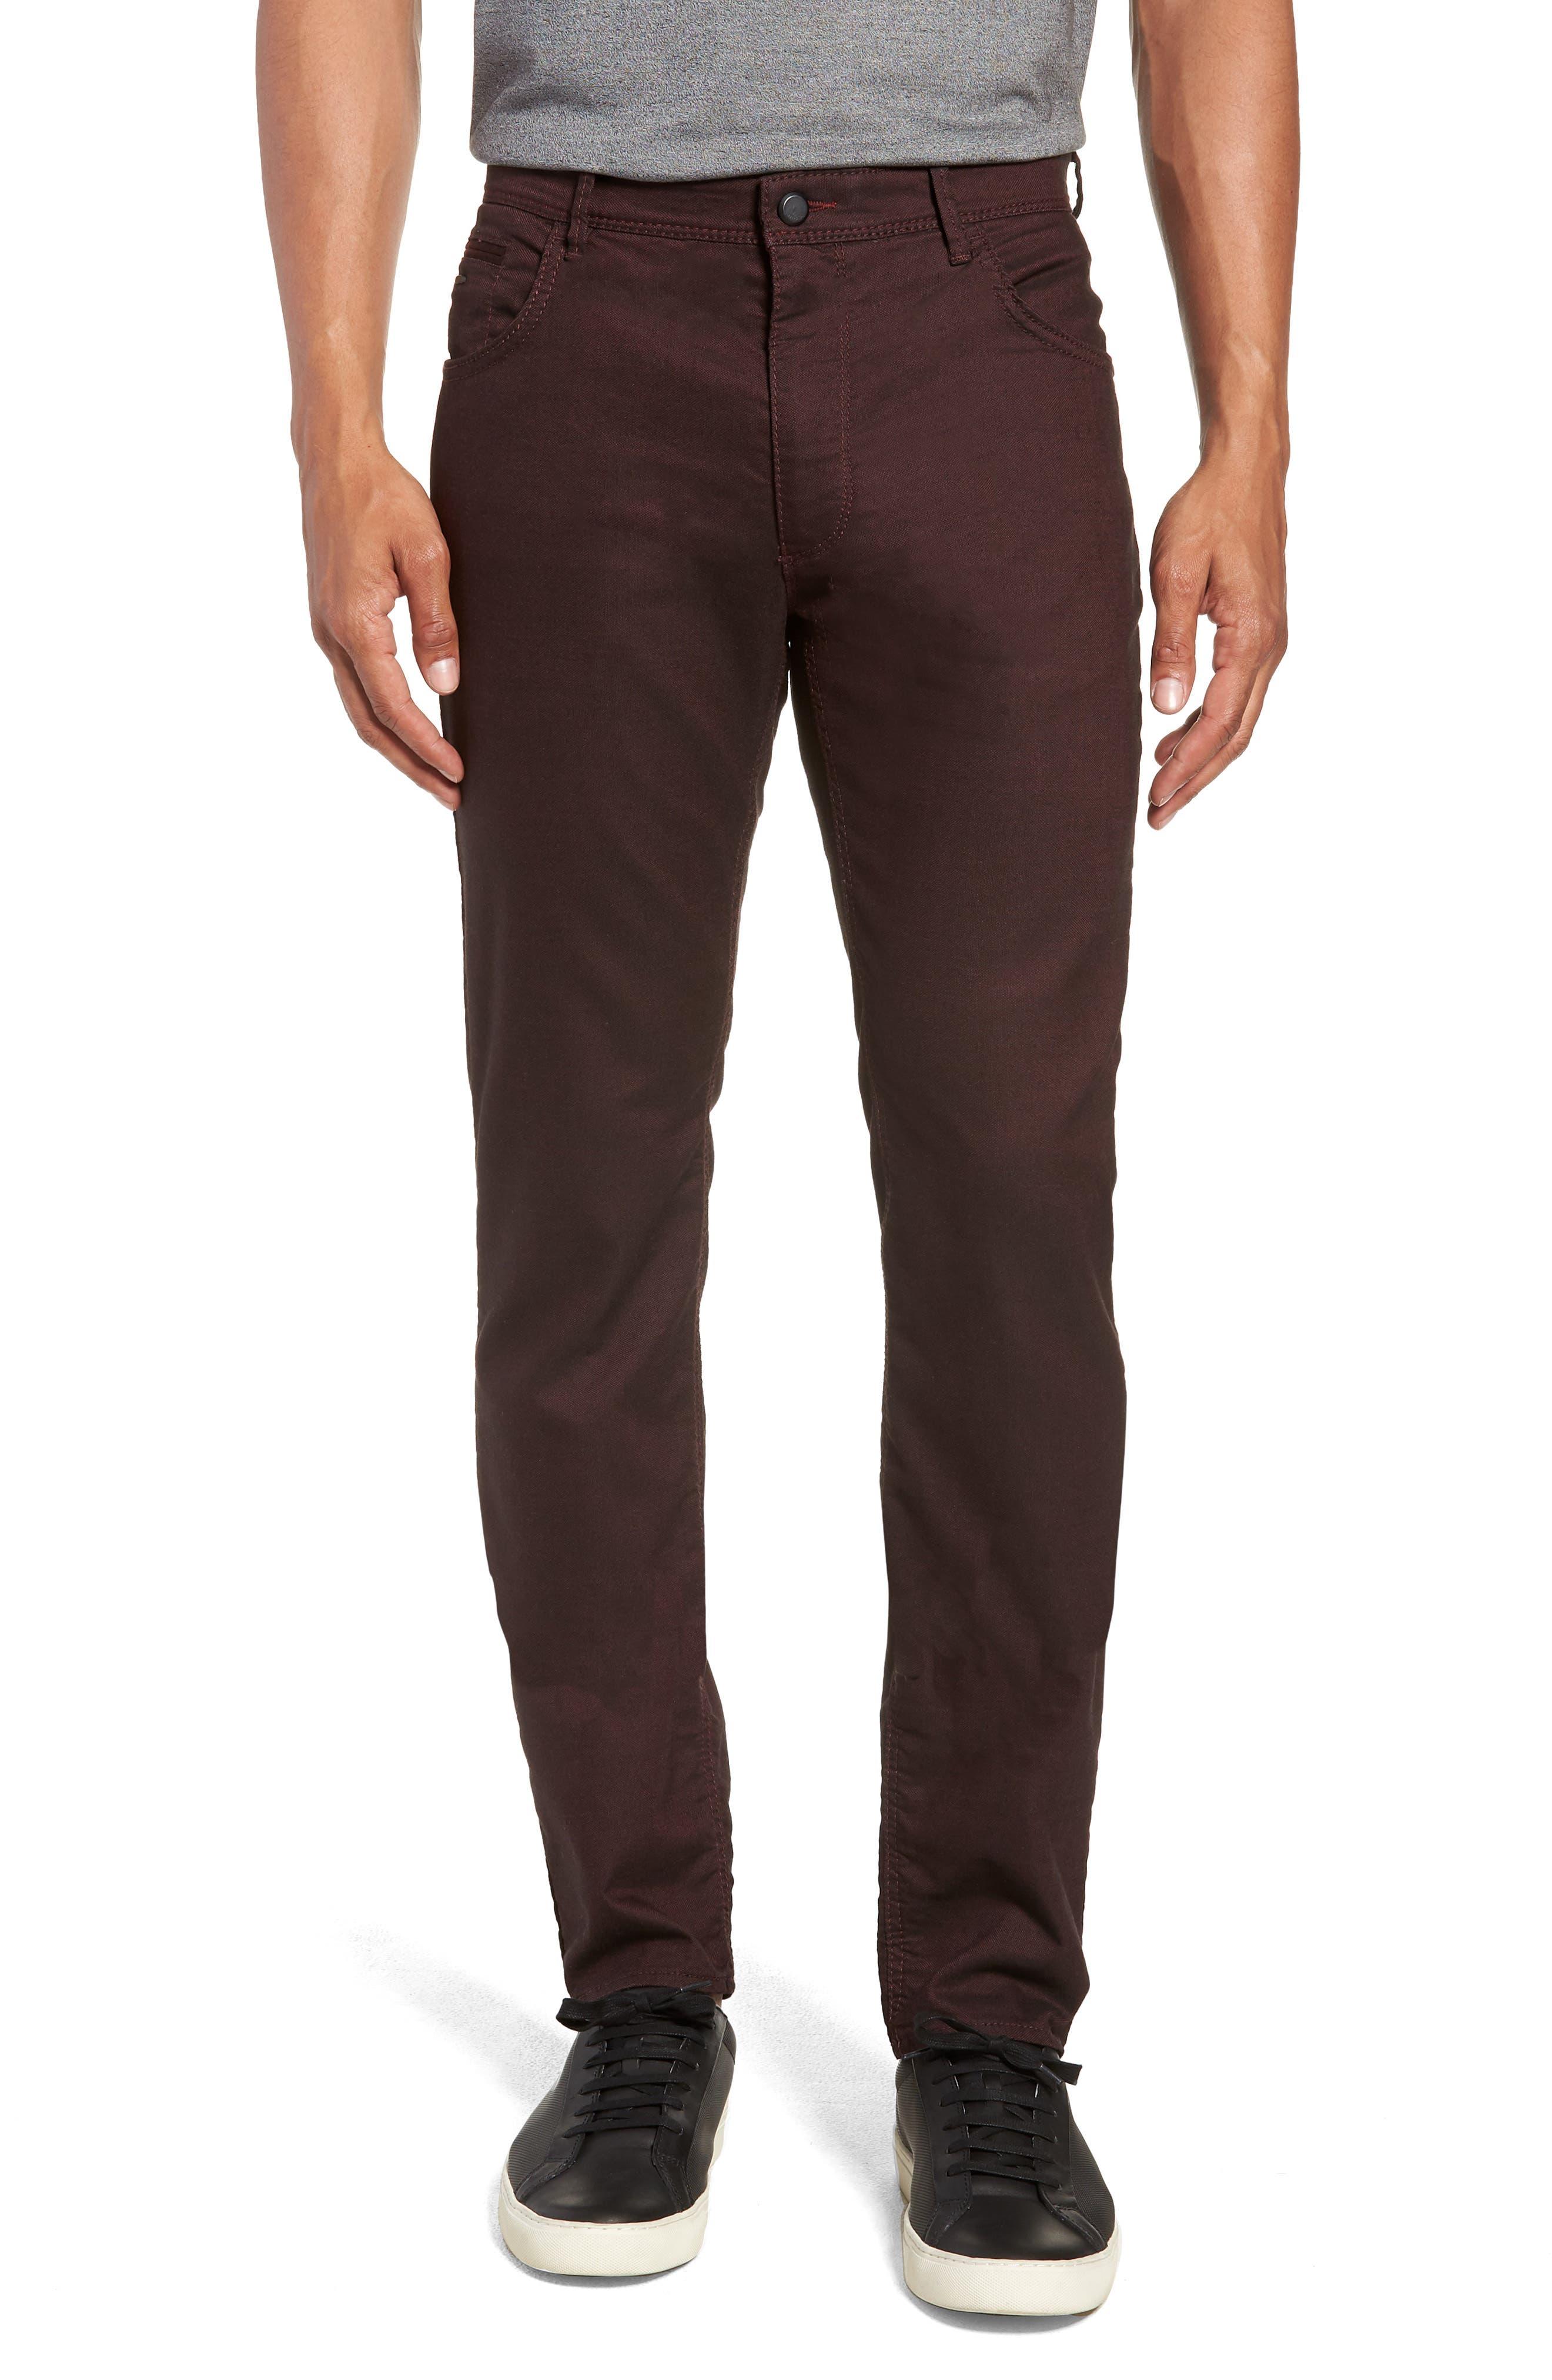 BRAX Slim Fit Five-Pocket Pants, Main, color, 602